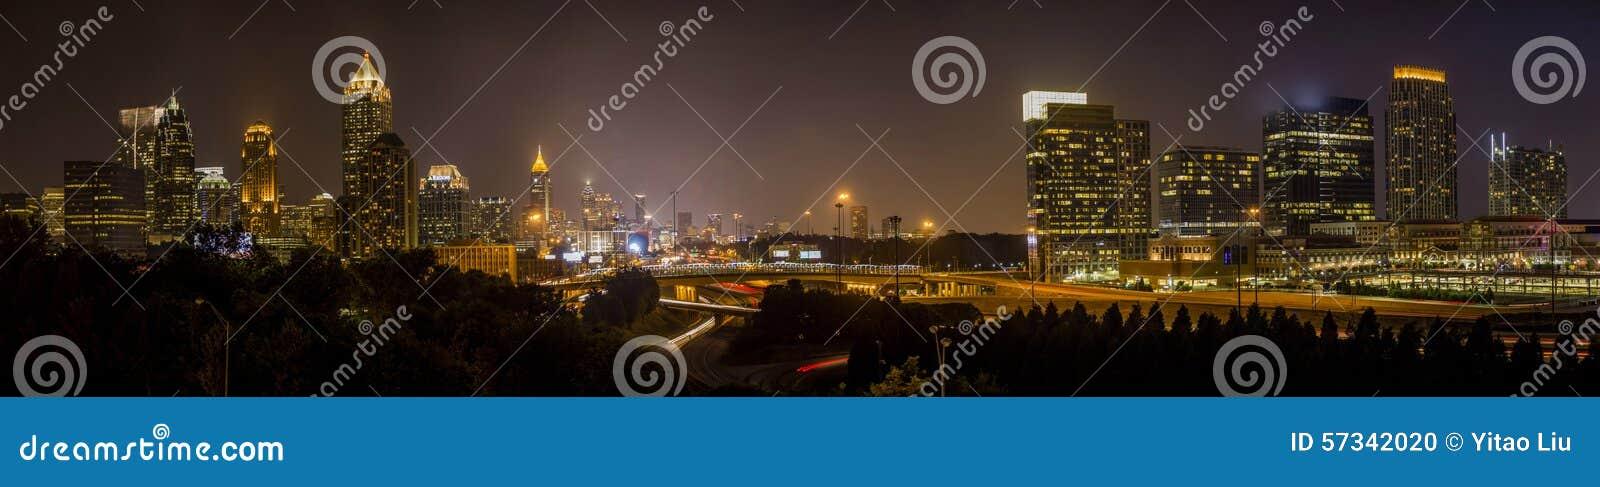 Atlanta Downtown night Skyline